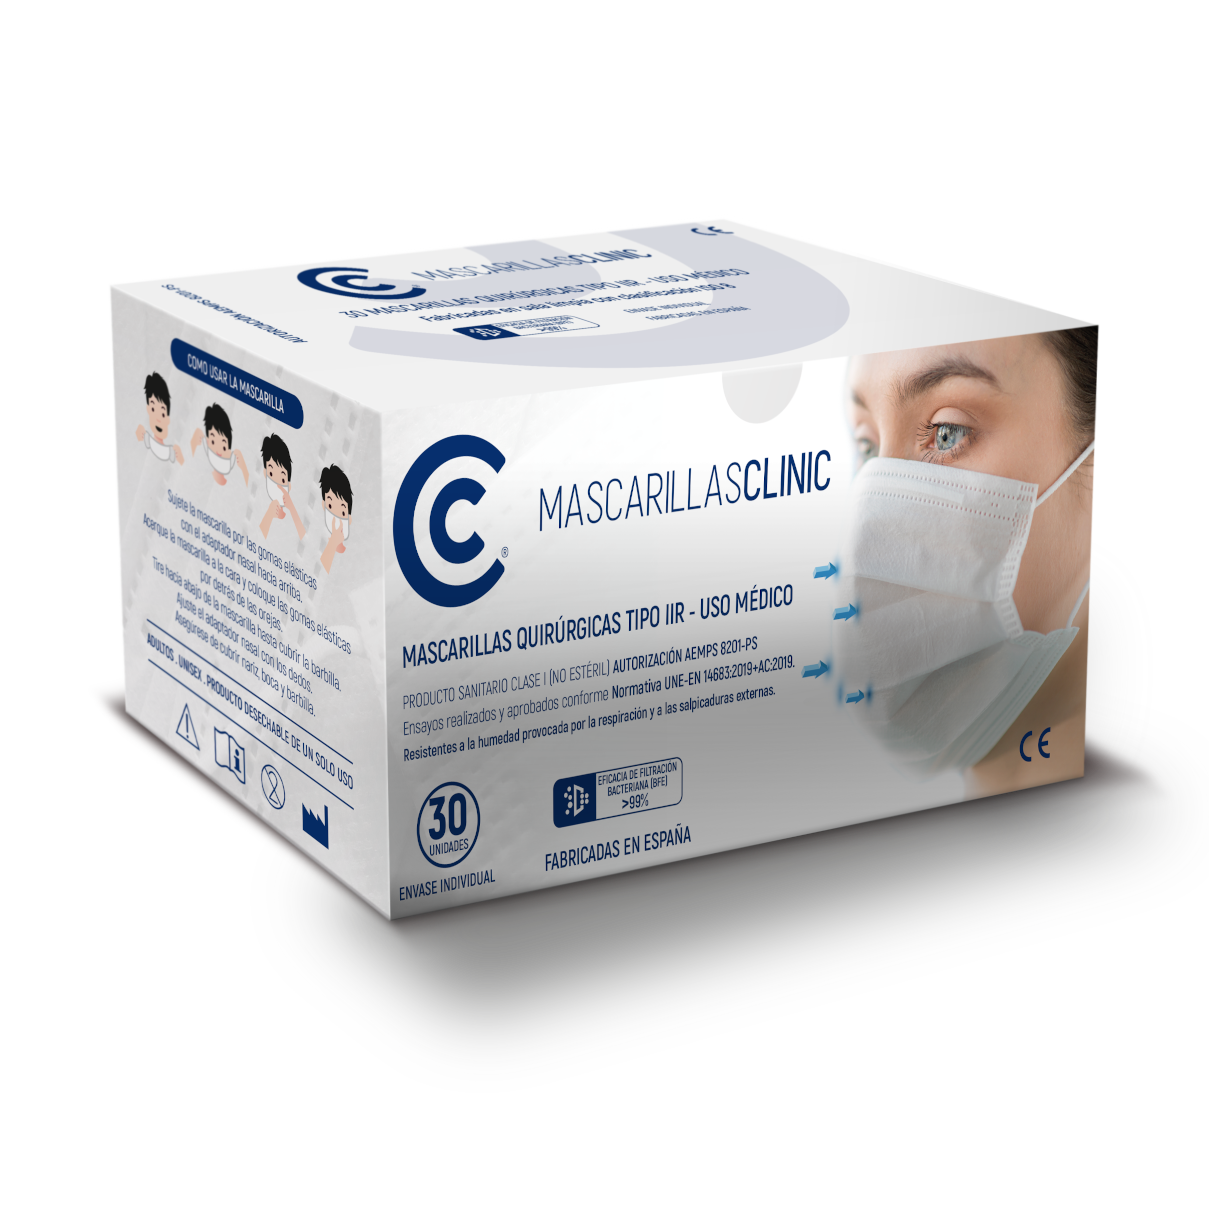 Mascarillas quirúrgicas Clinic 30 uds